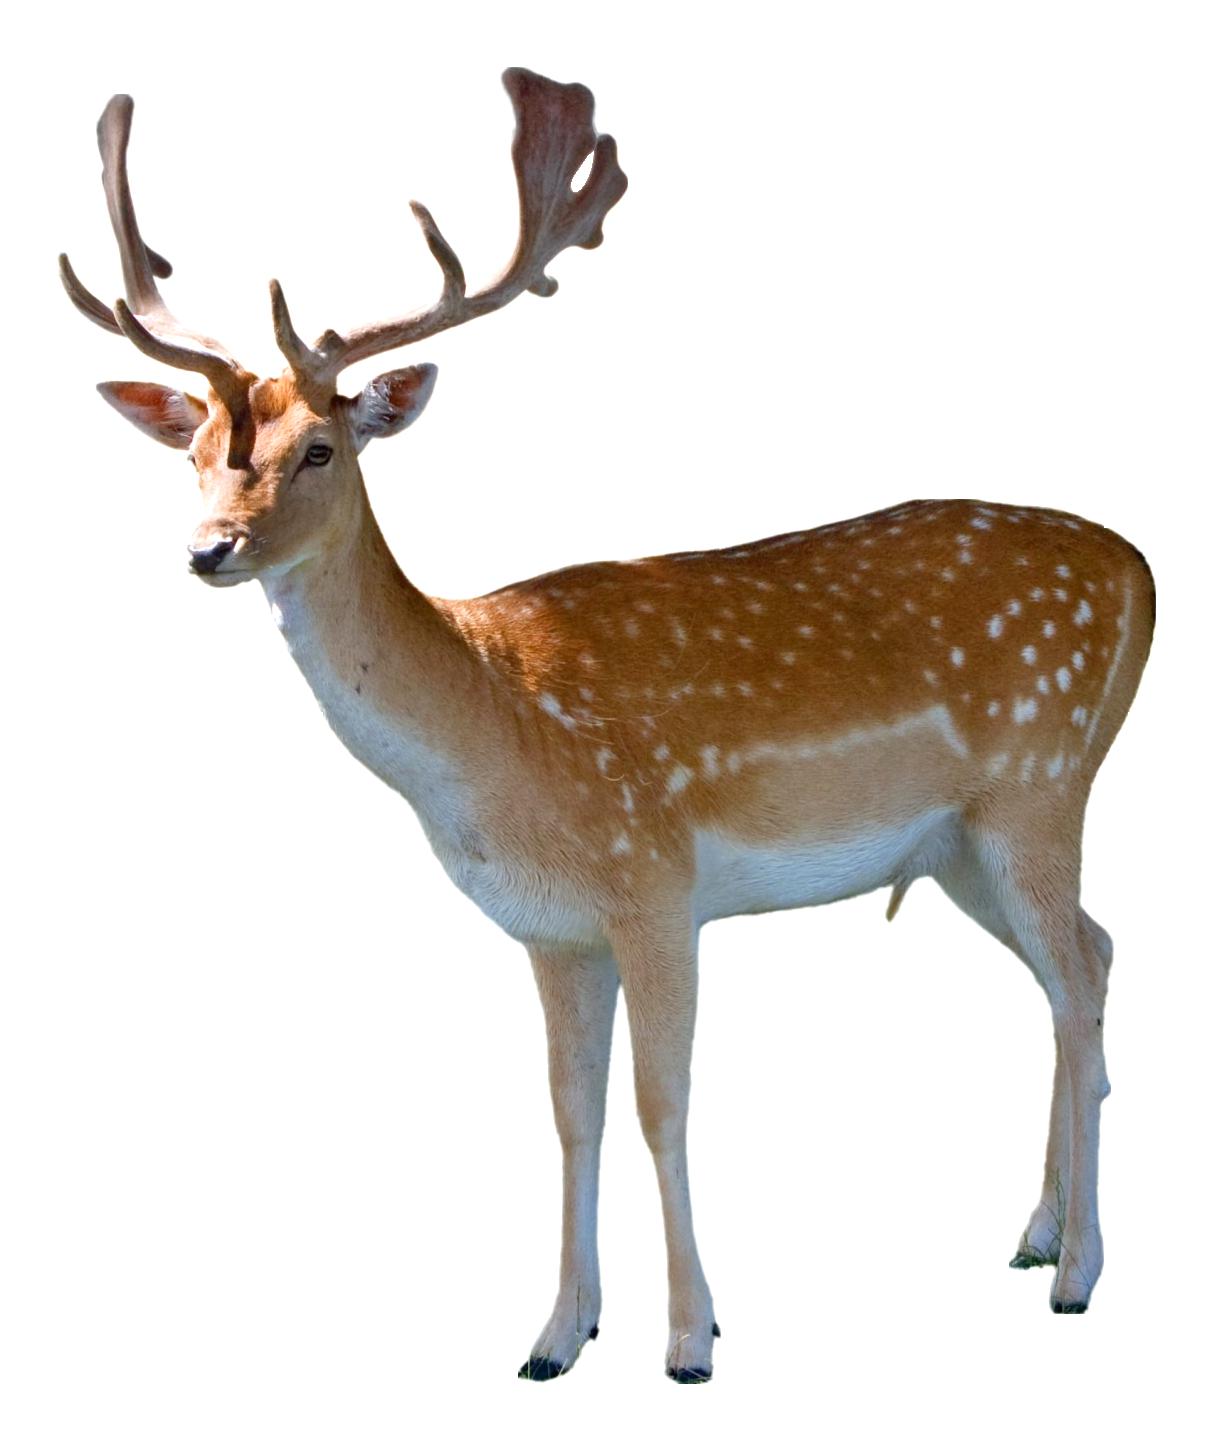 Image - PNGPIX-COM-Deer-PNG-Transparent-Image.png | Animal Jam Clans Wiki |  FANDOM powered by Wikia - Deer PNG